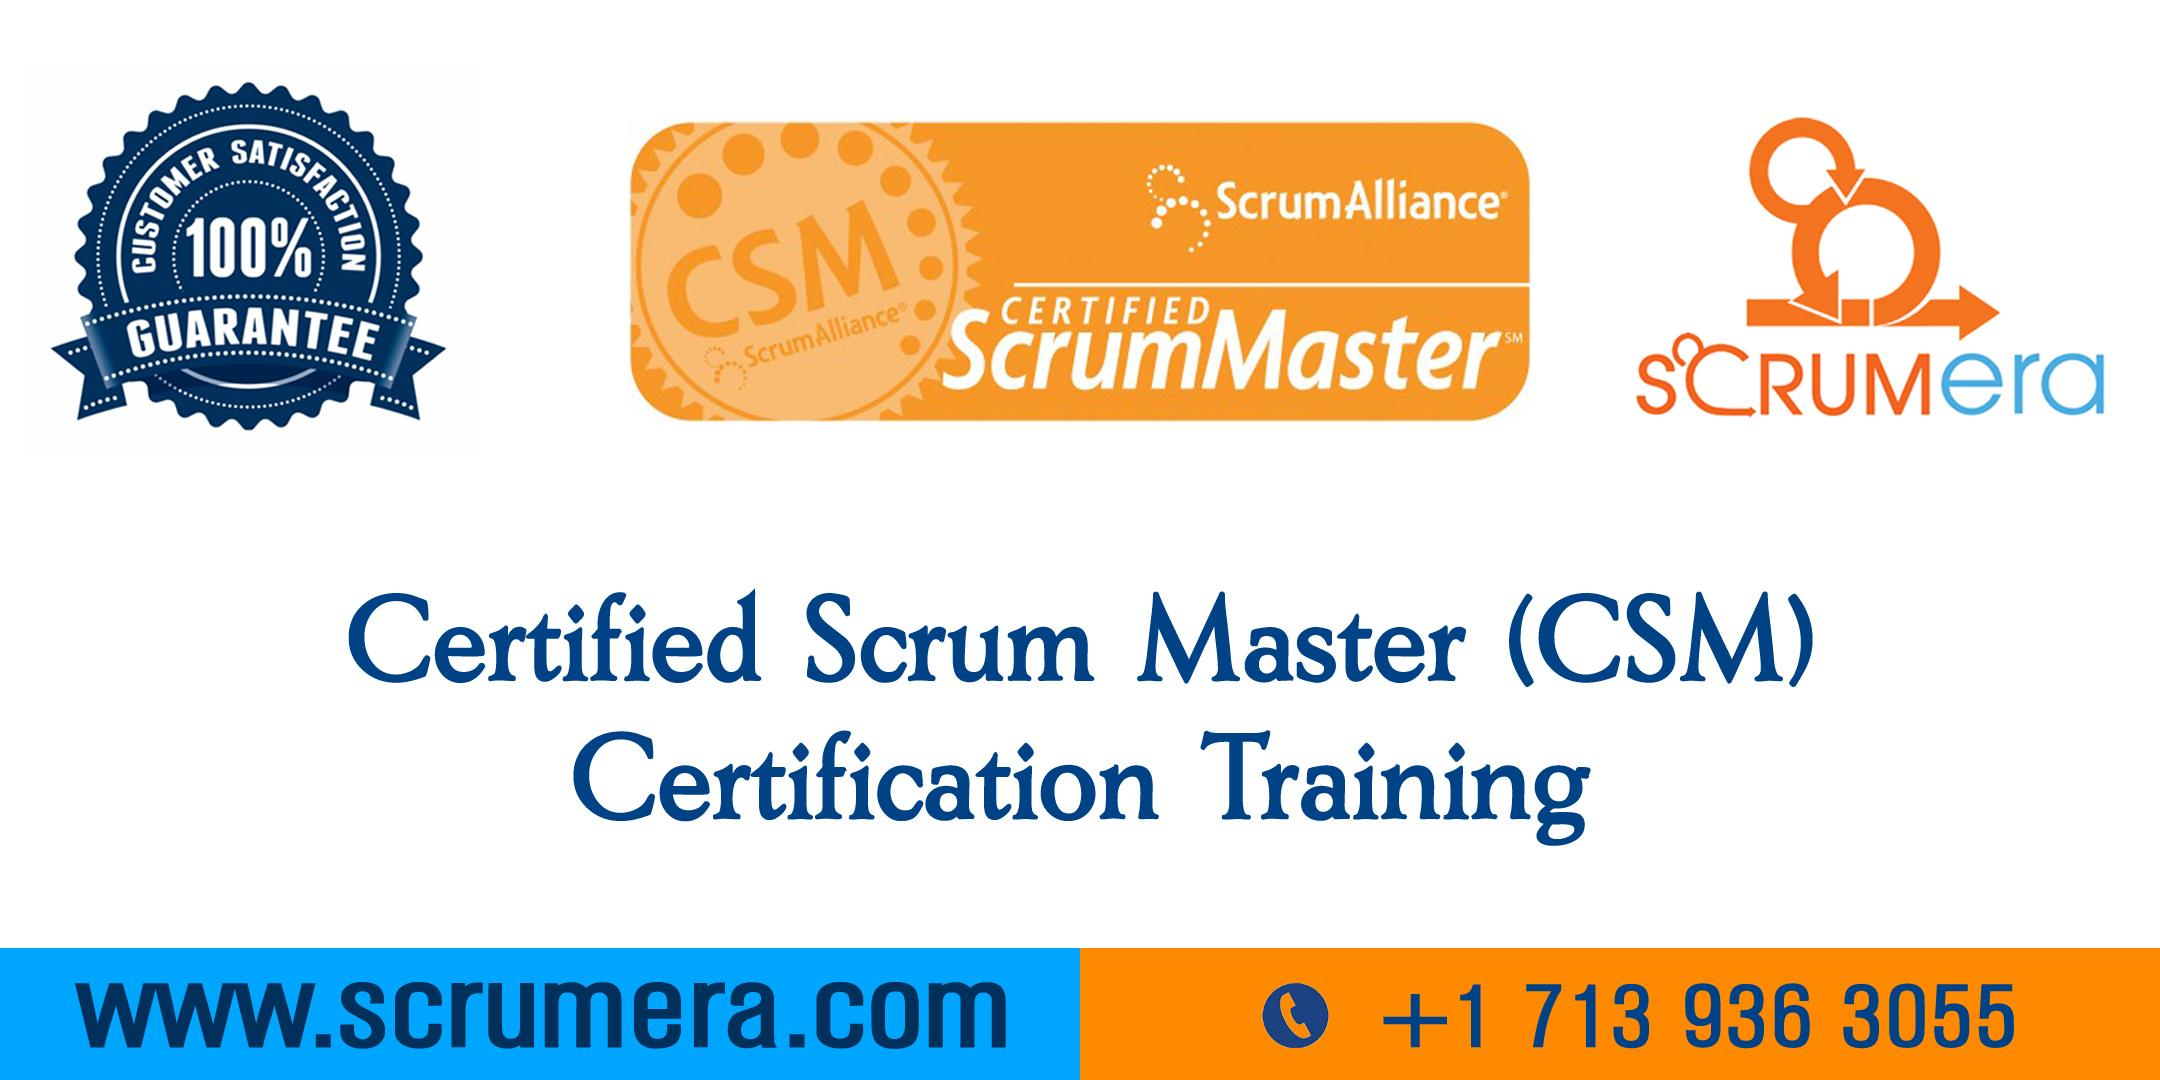 Scrum Master Certification | CSM Training | CSM Certification Workshop | Certified Scrum Master (CSM) Training in Rochester, NY | ScrumERA